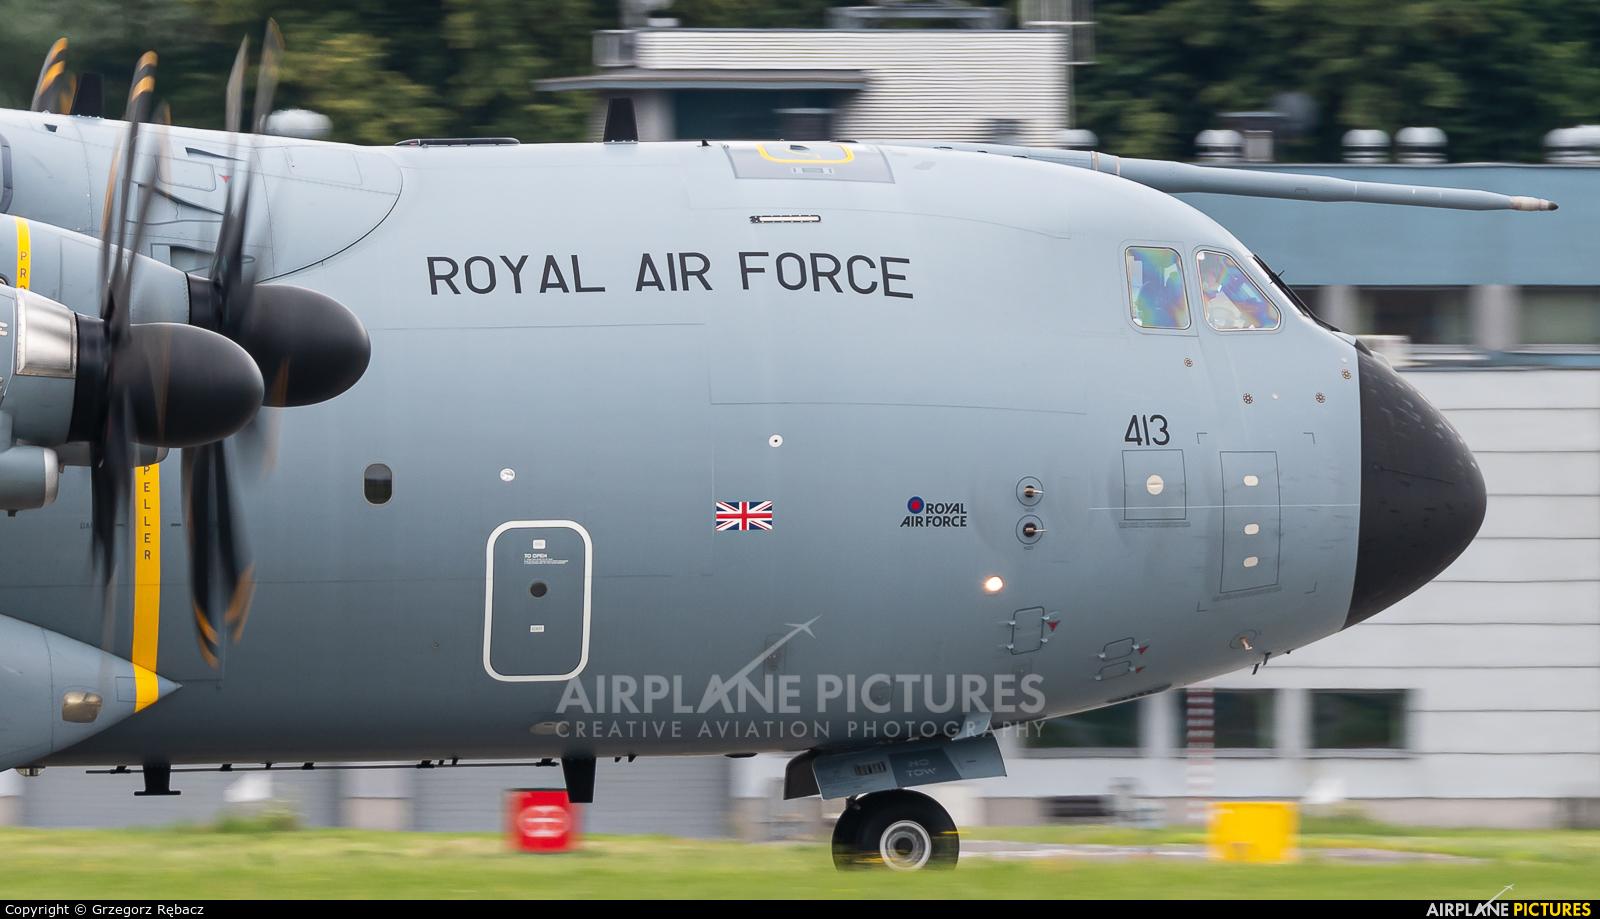 Royal Air Force ZM413 aircraft at Kraków - John Paul II Intl